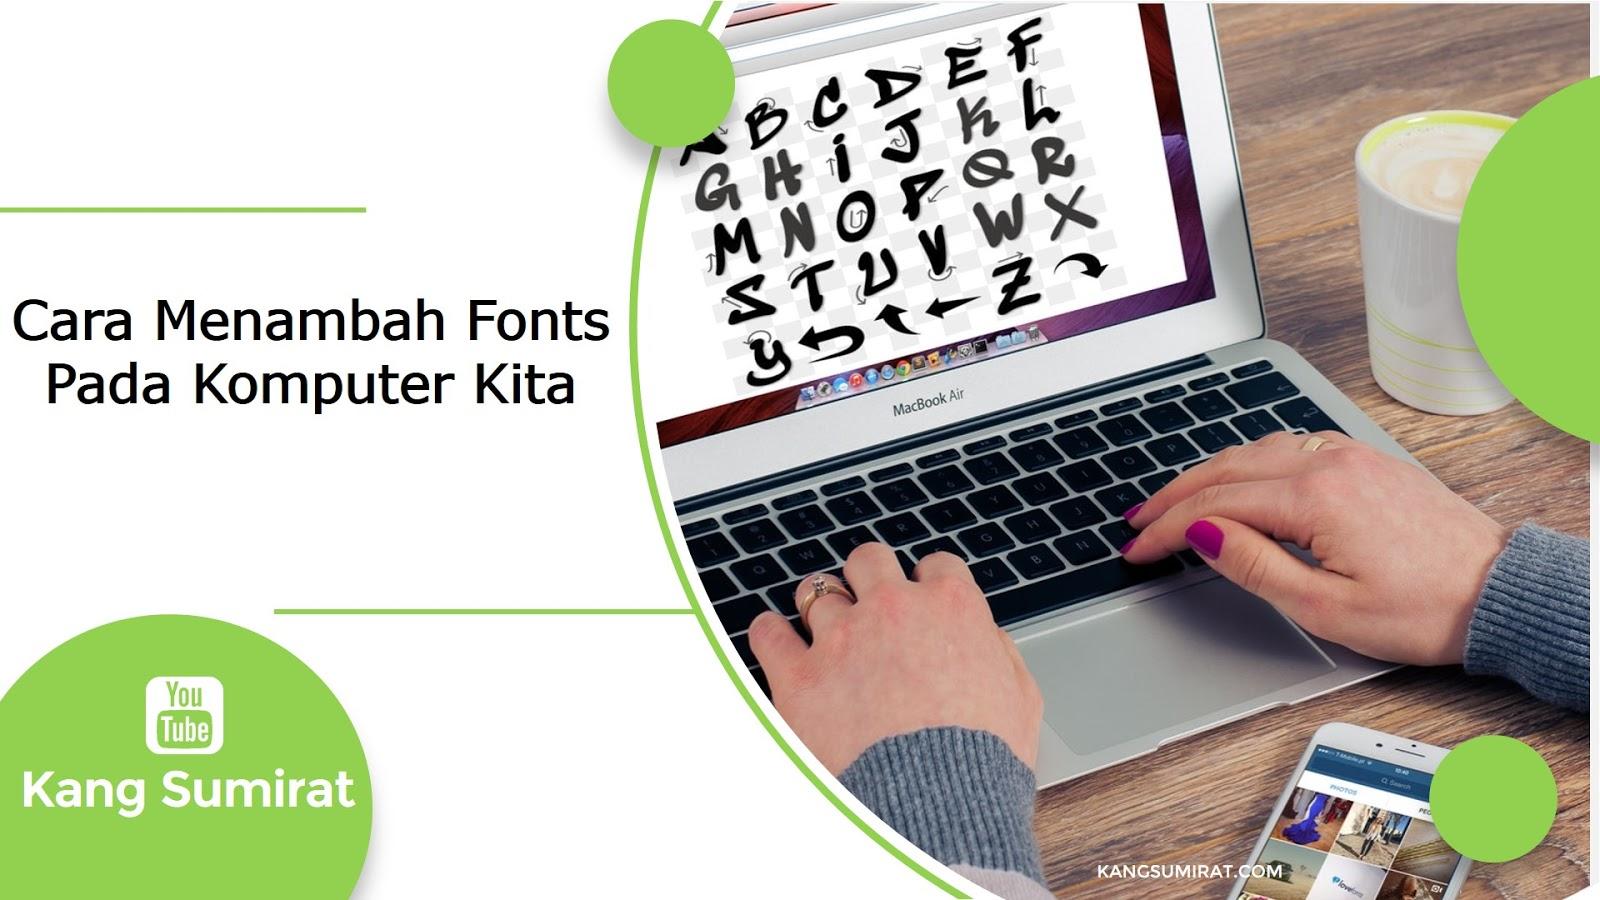 Cara Menambah Fonts Pada Komputer Atau Laptop